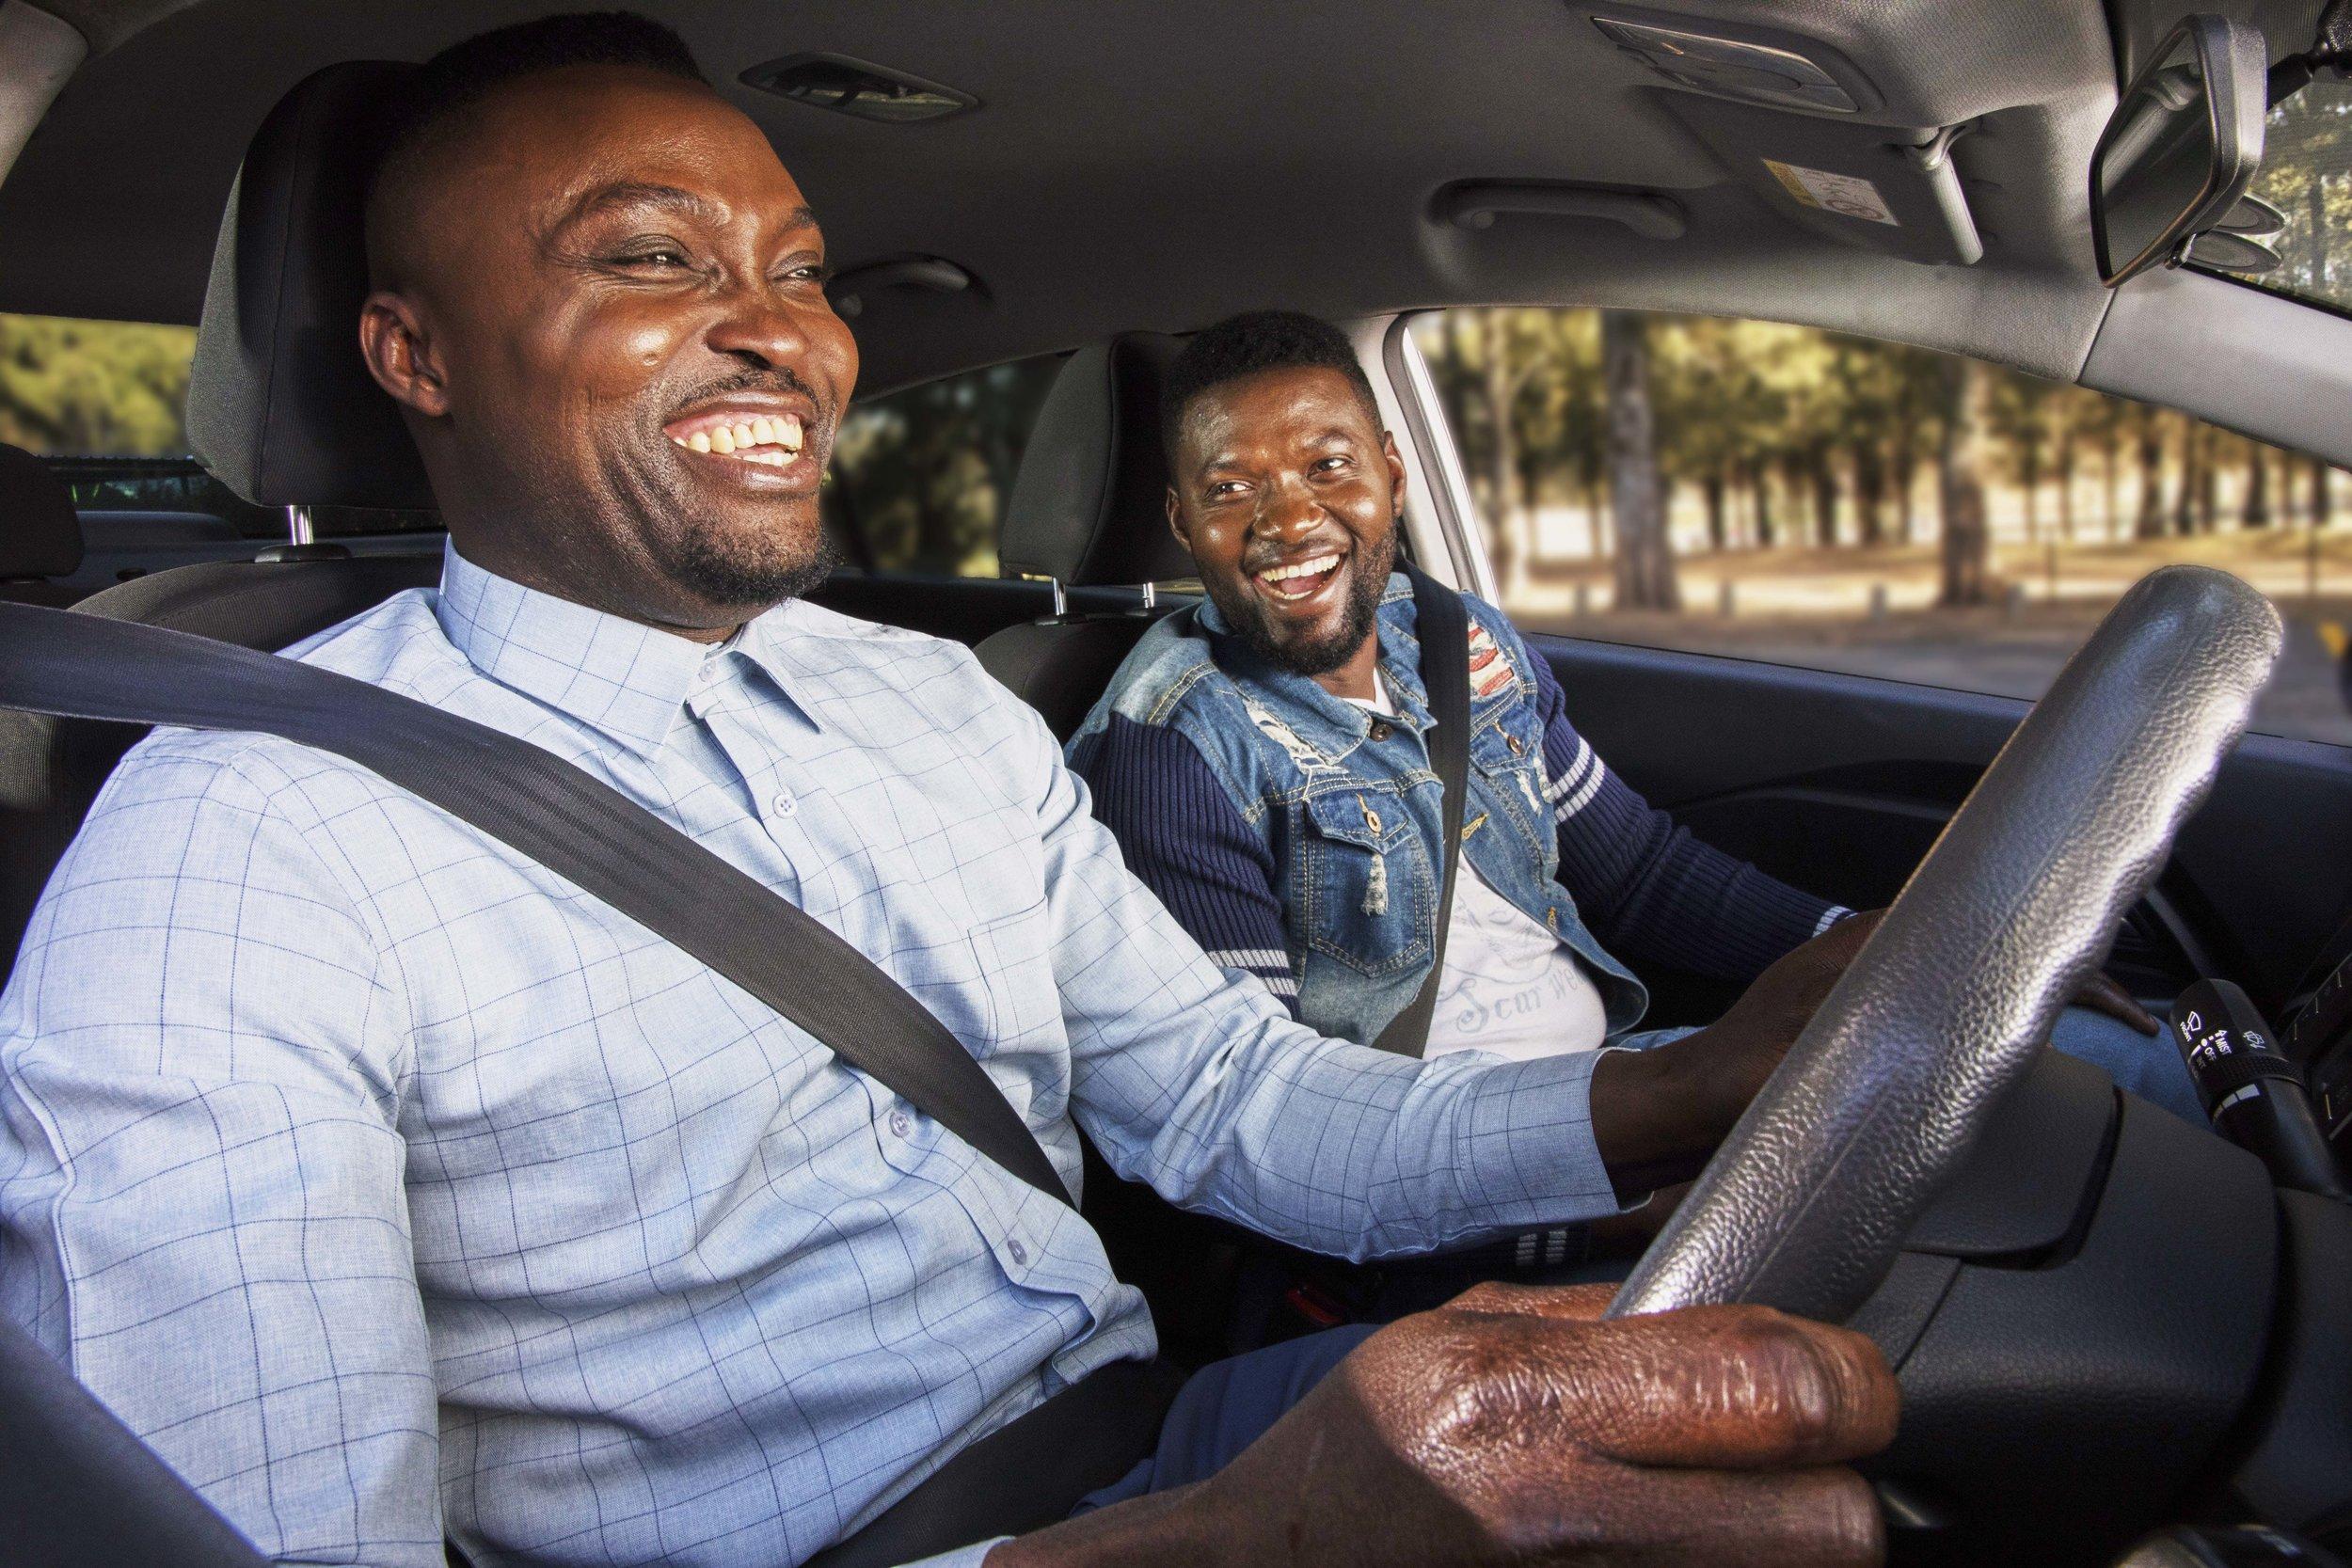 Uber_shoot_Nigeria_Pair-102_optimized.jpg